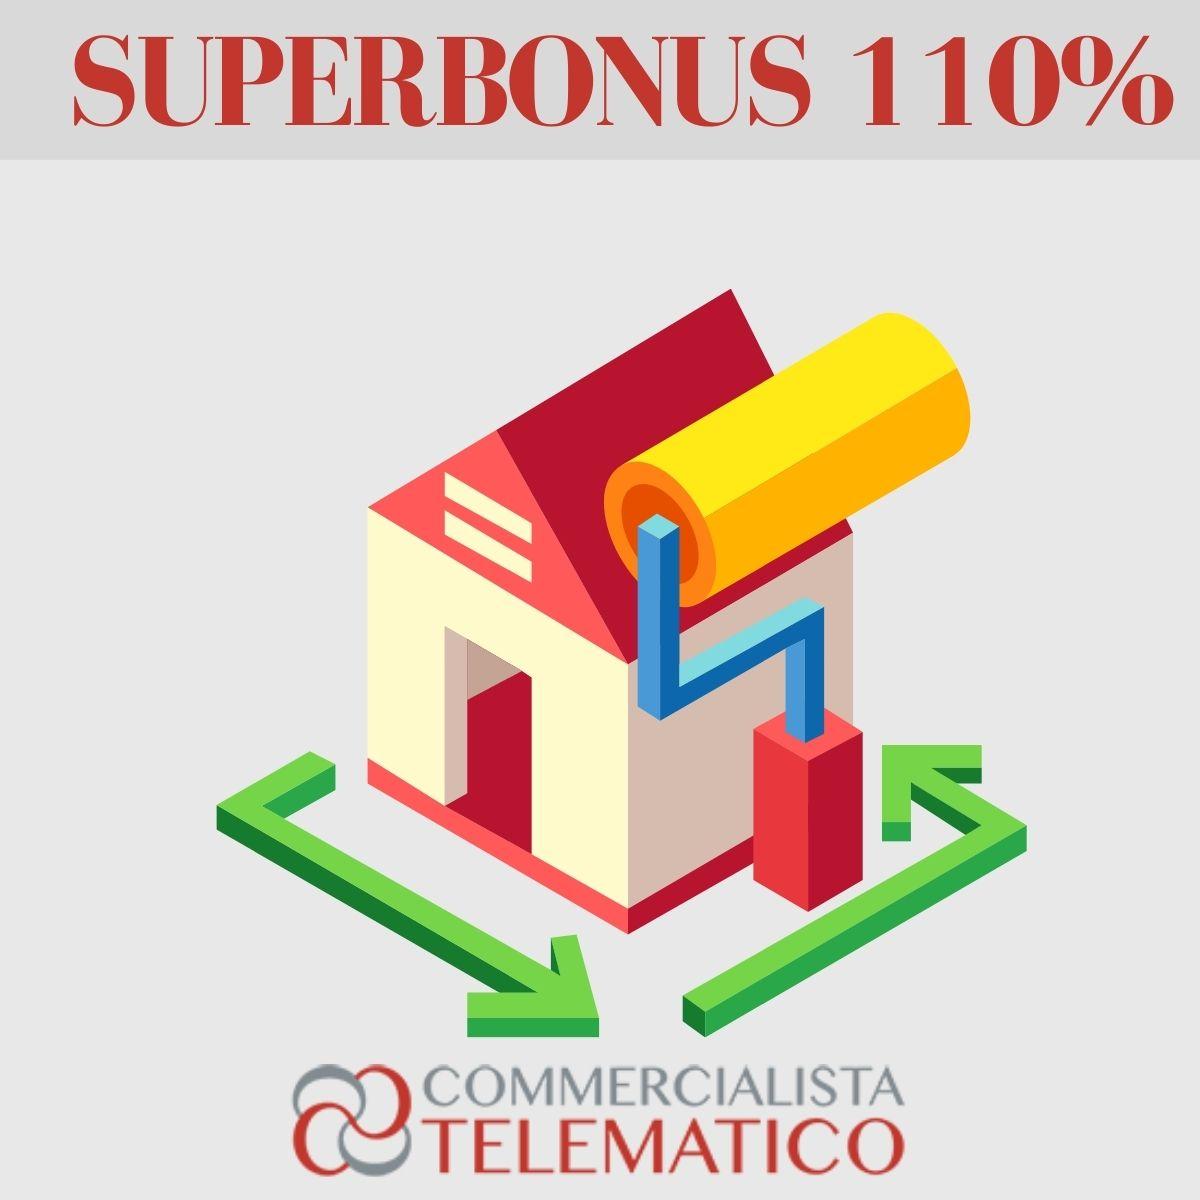 superbonus massima agevolazione